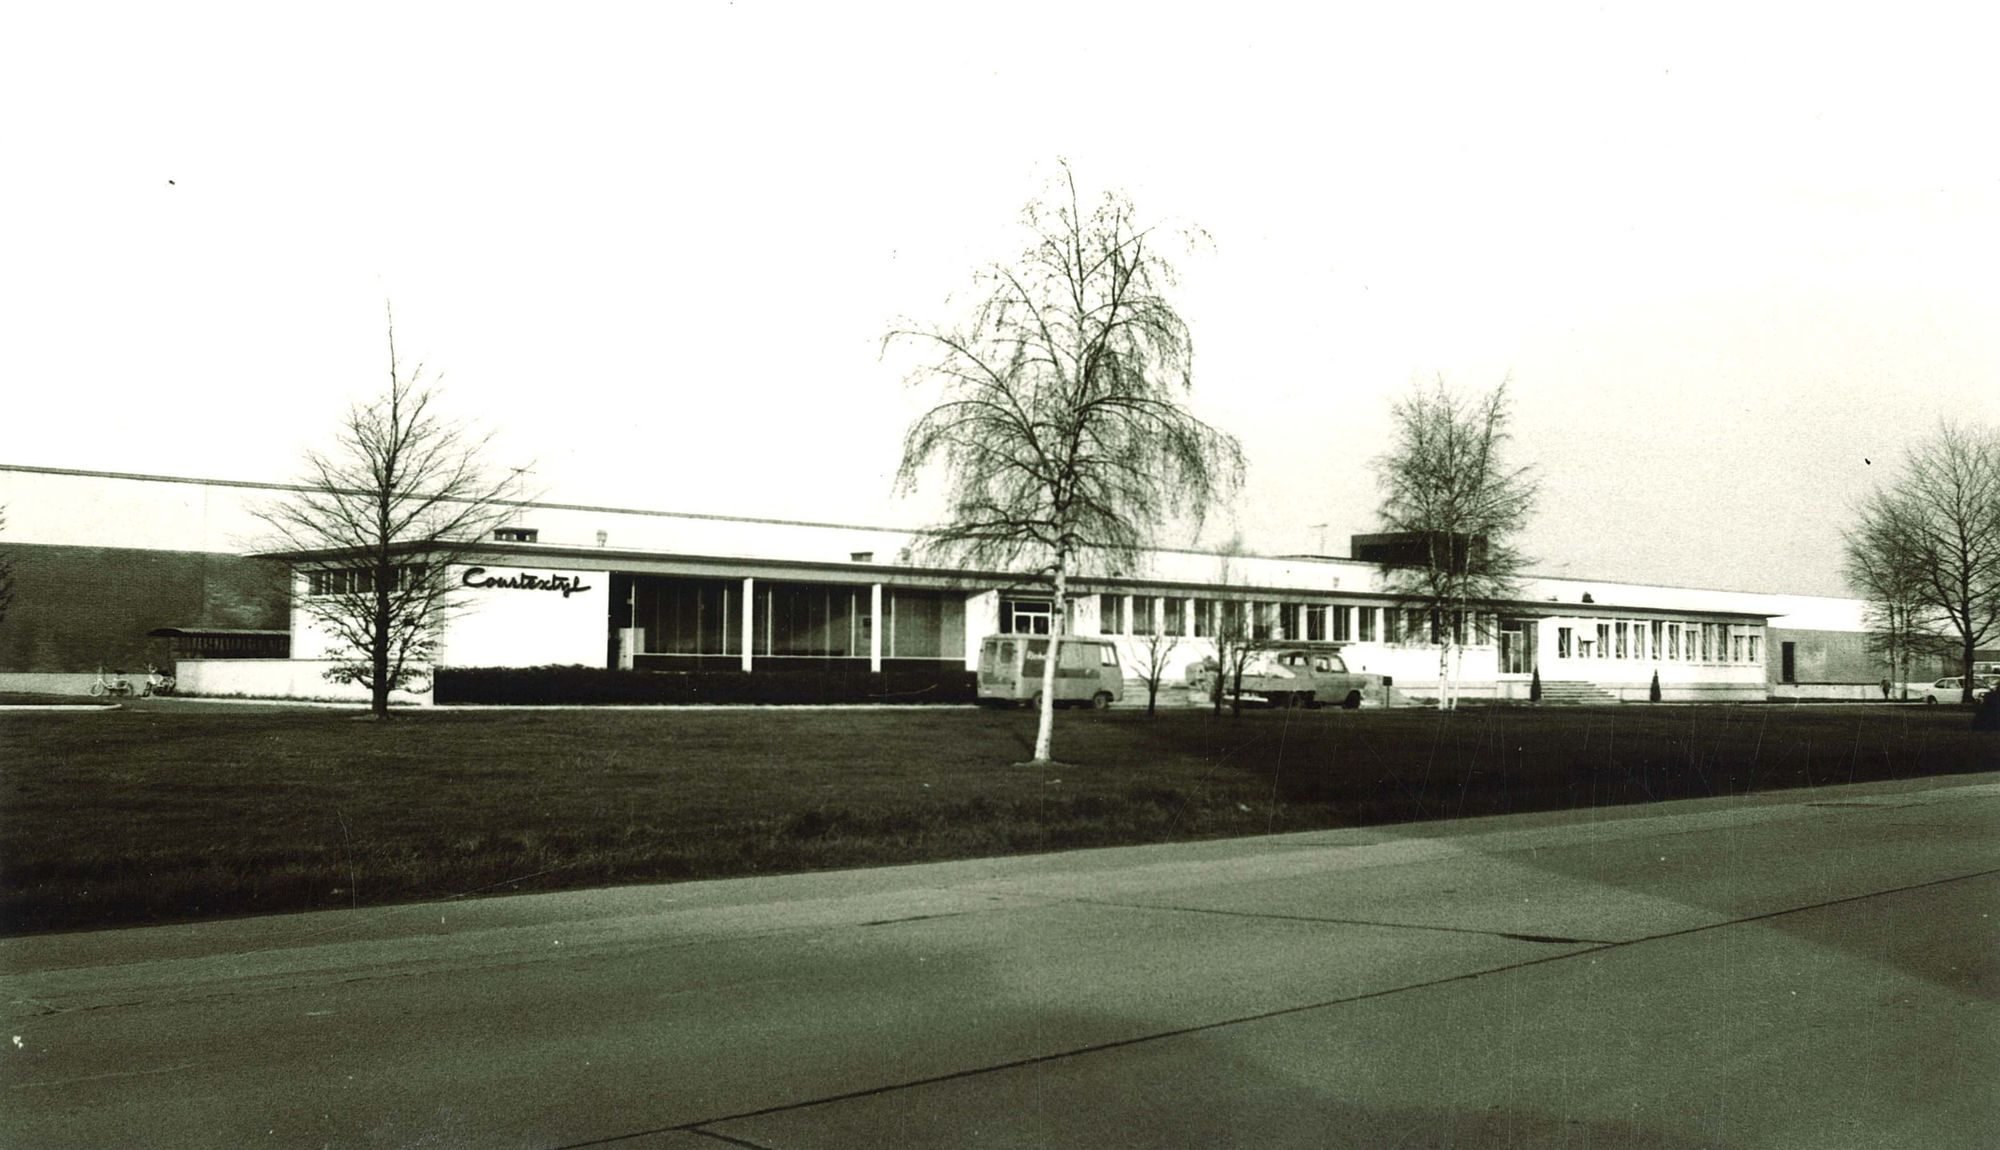 Courtextil Harelbeke 1975